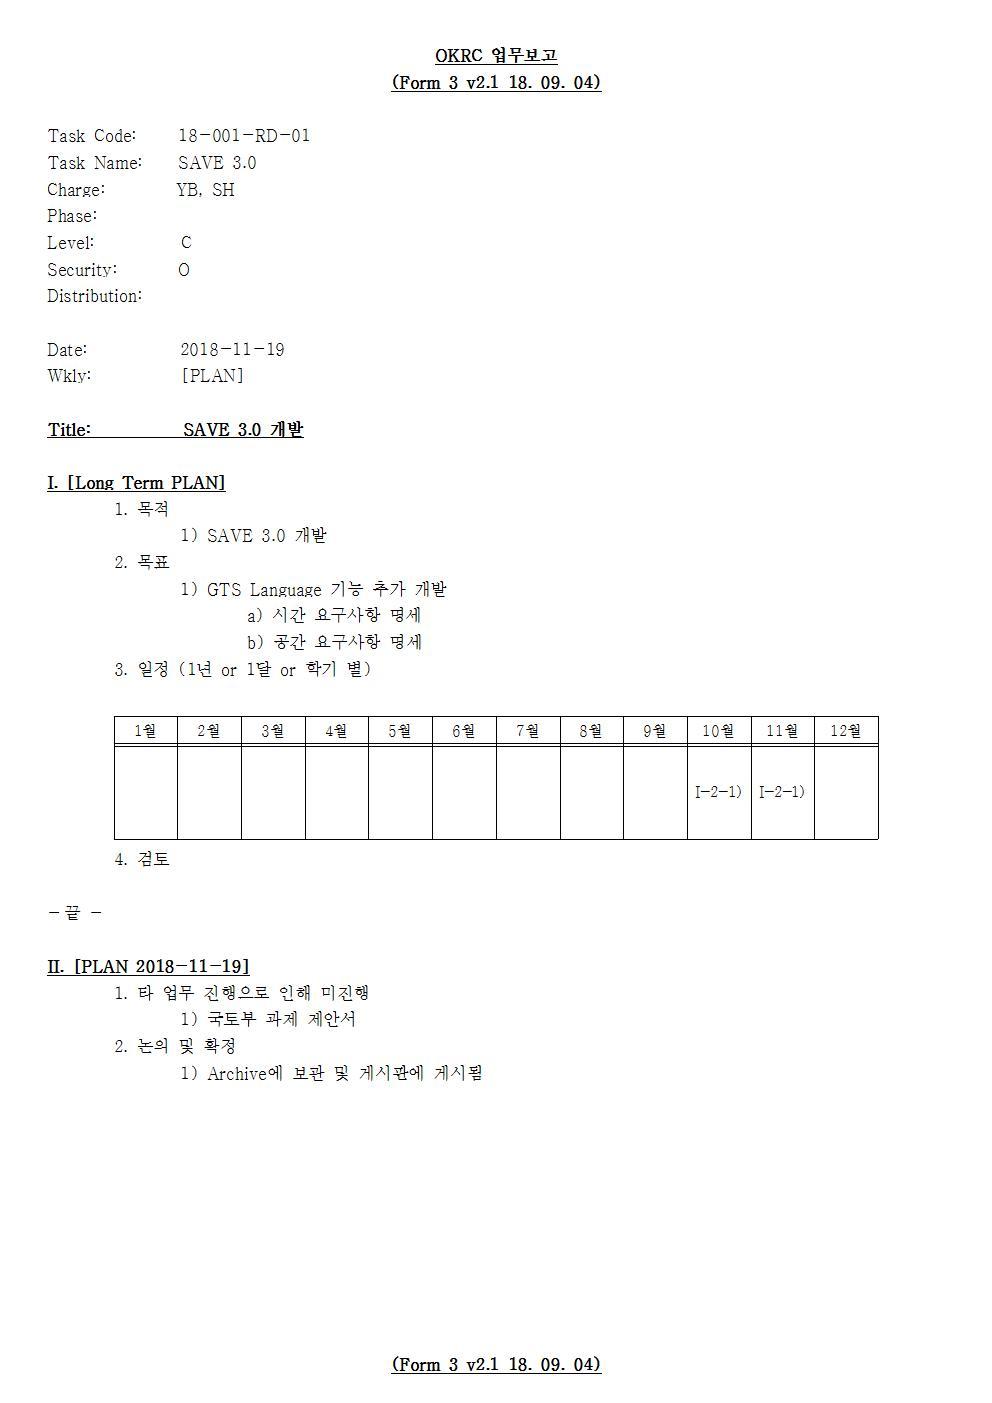 D-[18-001-RD-01]-[SAVE 3.0]-[2018-11-19][SH]001.jpg